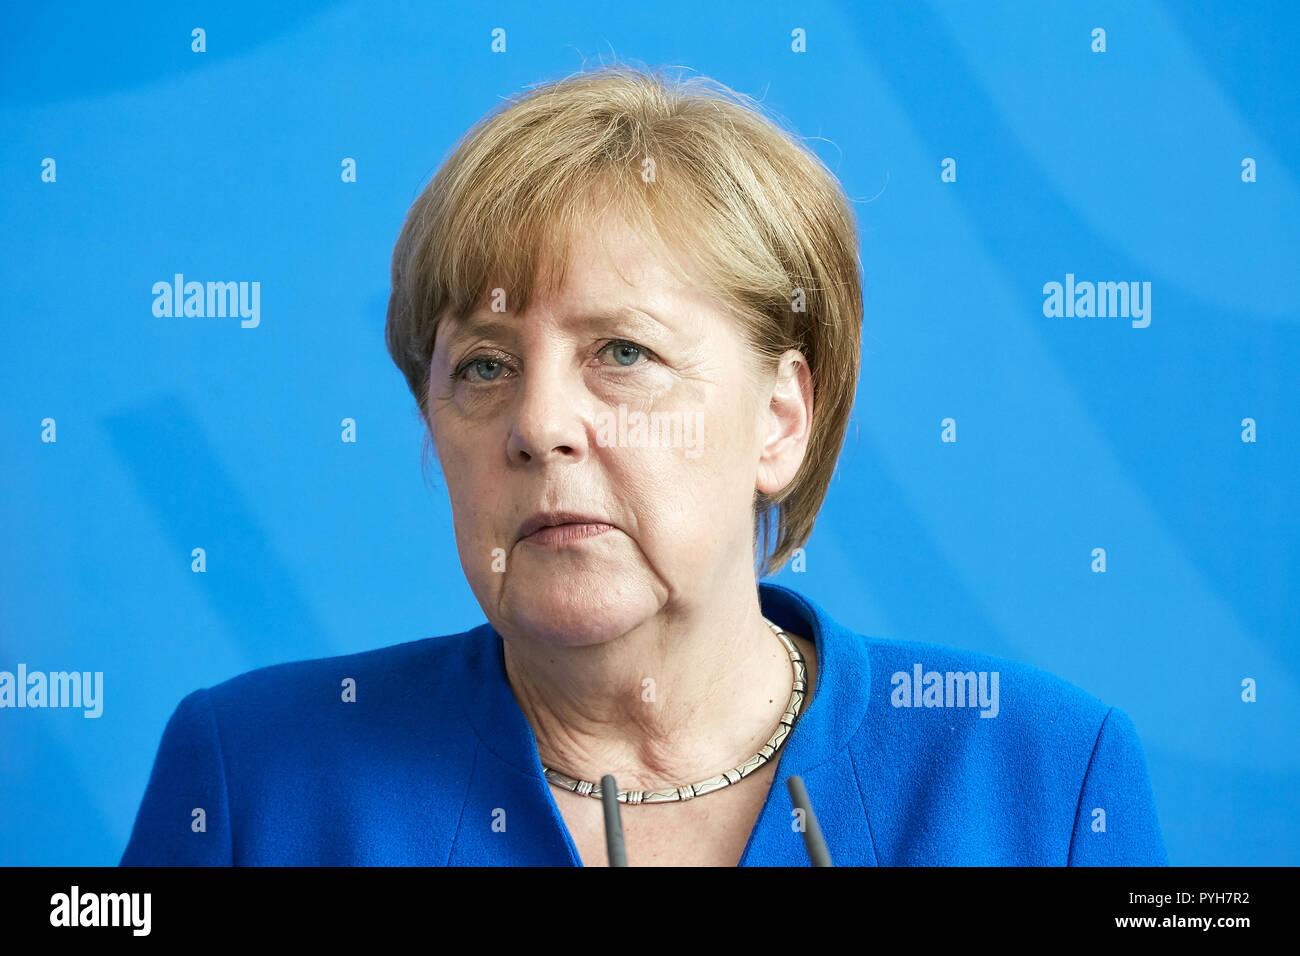 Berlin, Germany - Chancellor Angela Merkel. - Stock Image